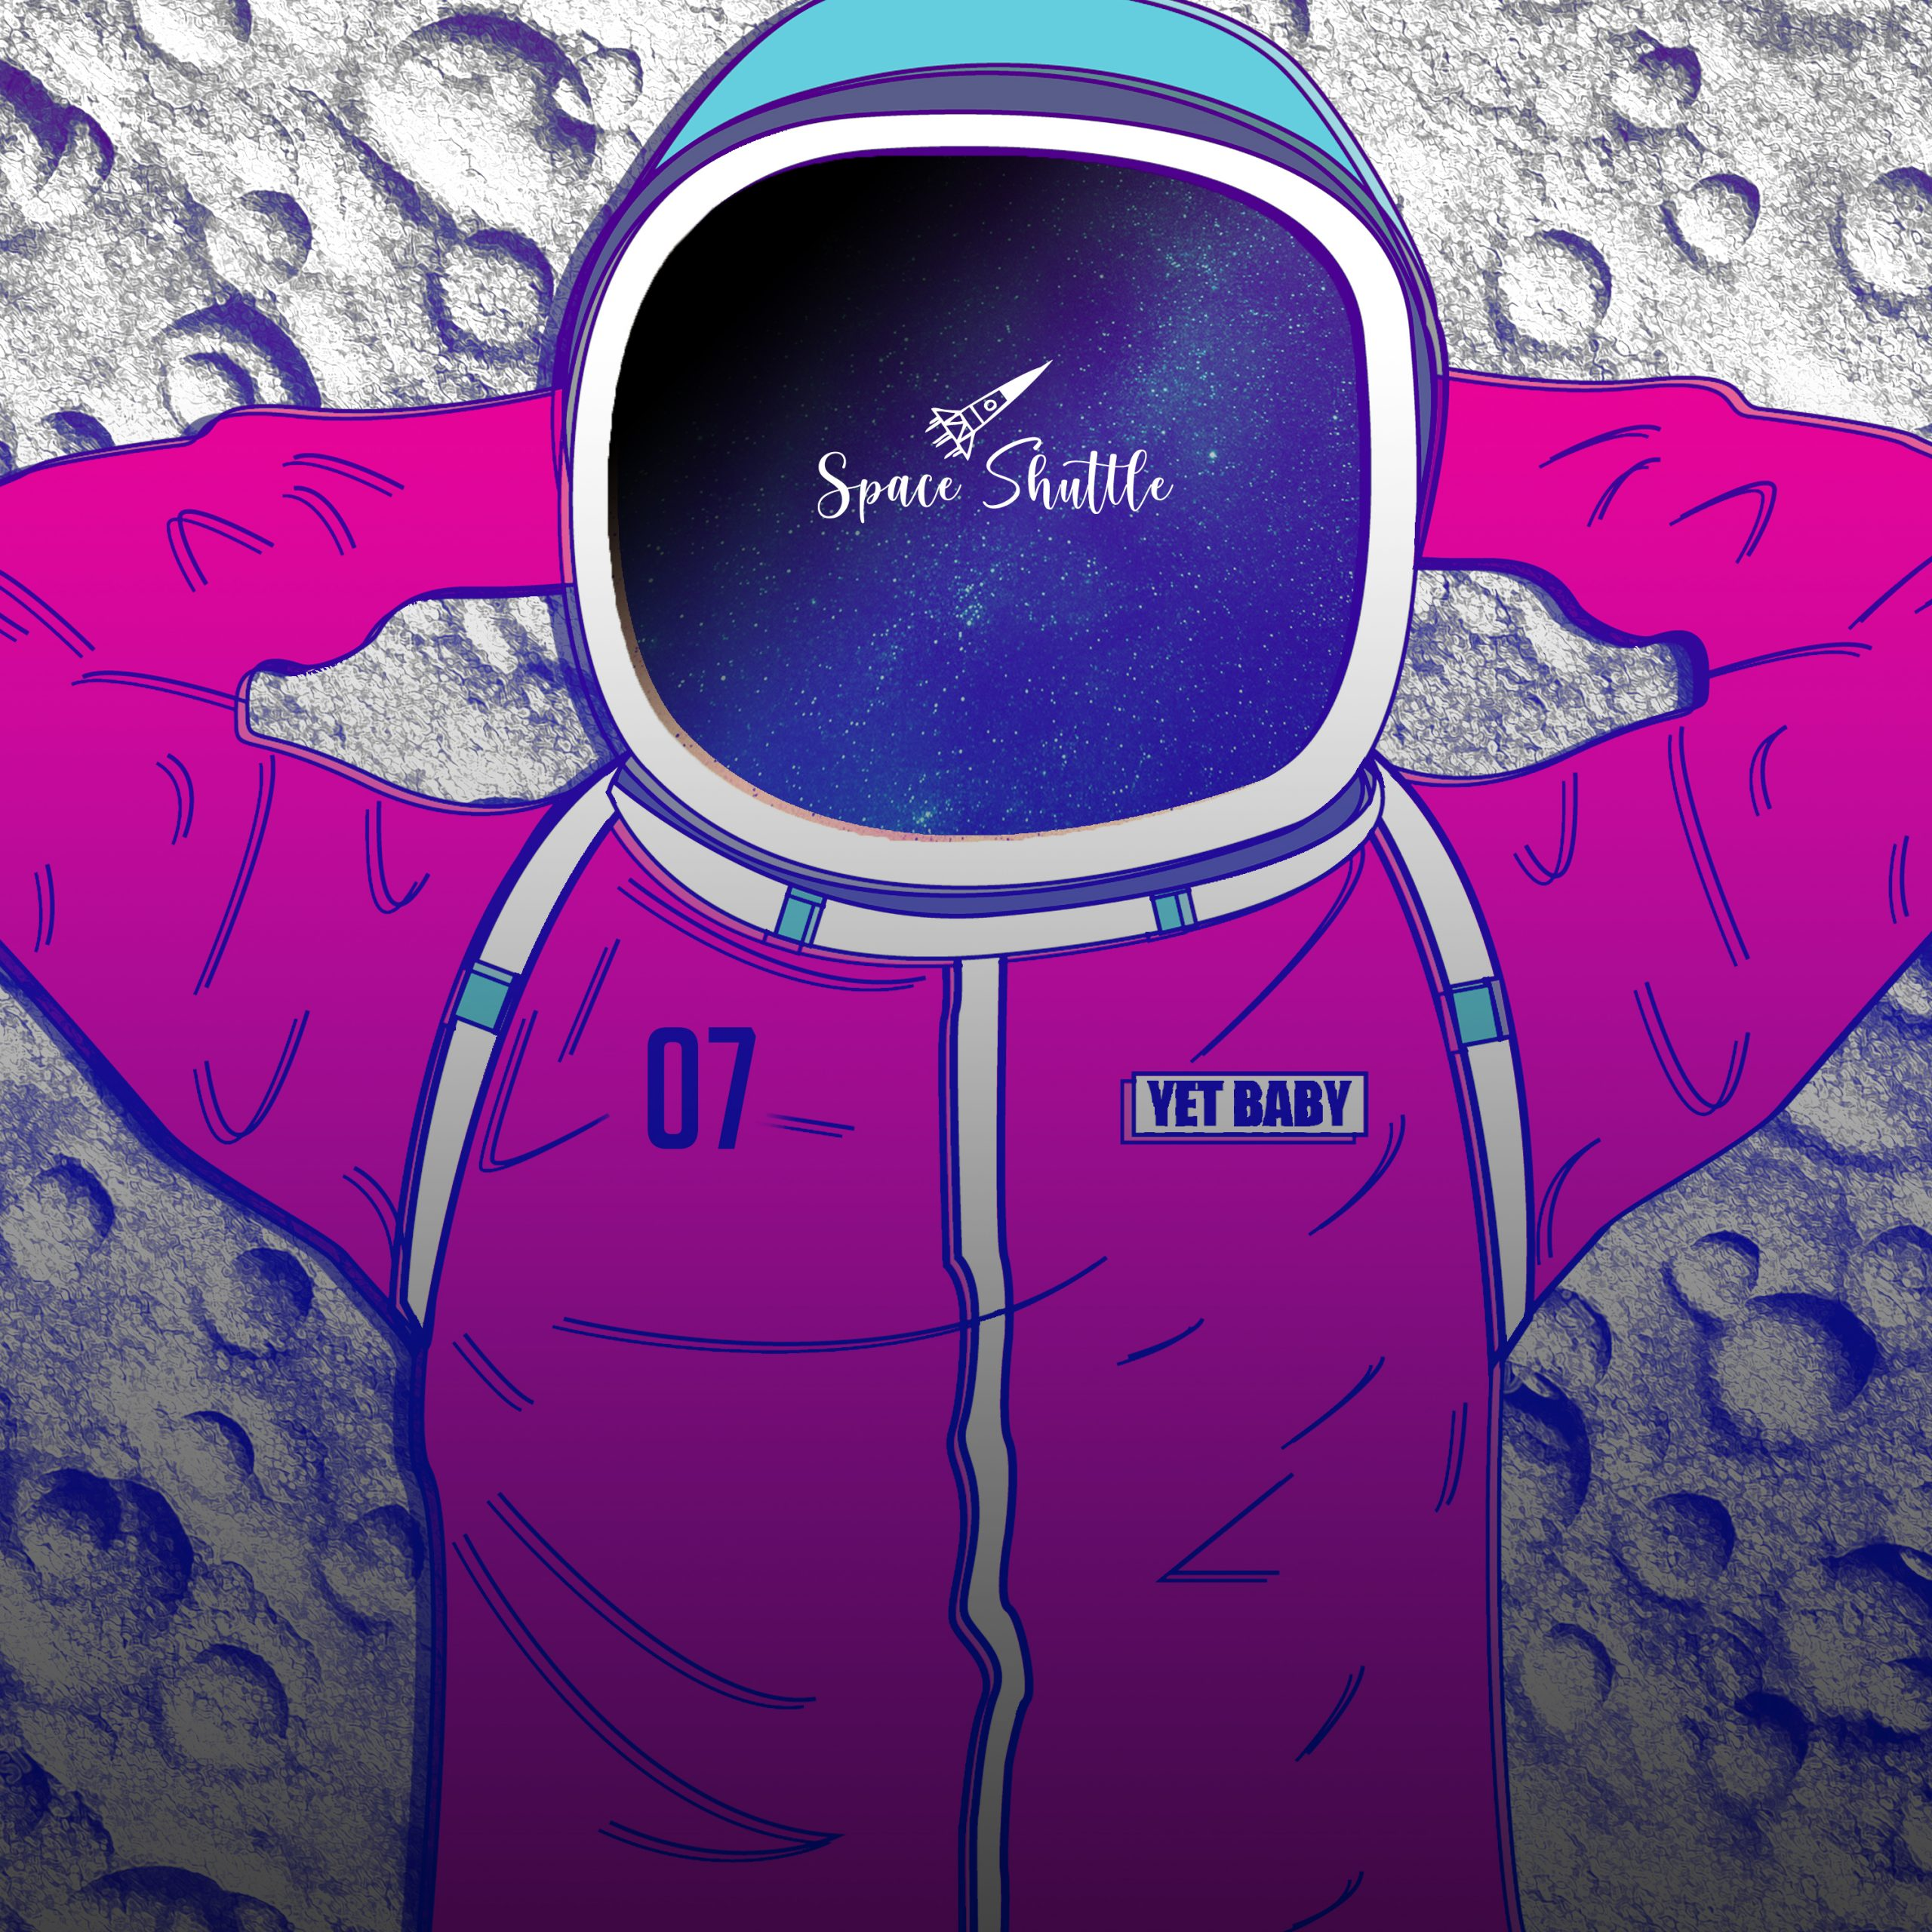 YetBaby - Space shuttle (Single Instrumental)